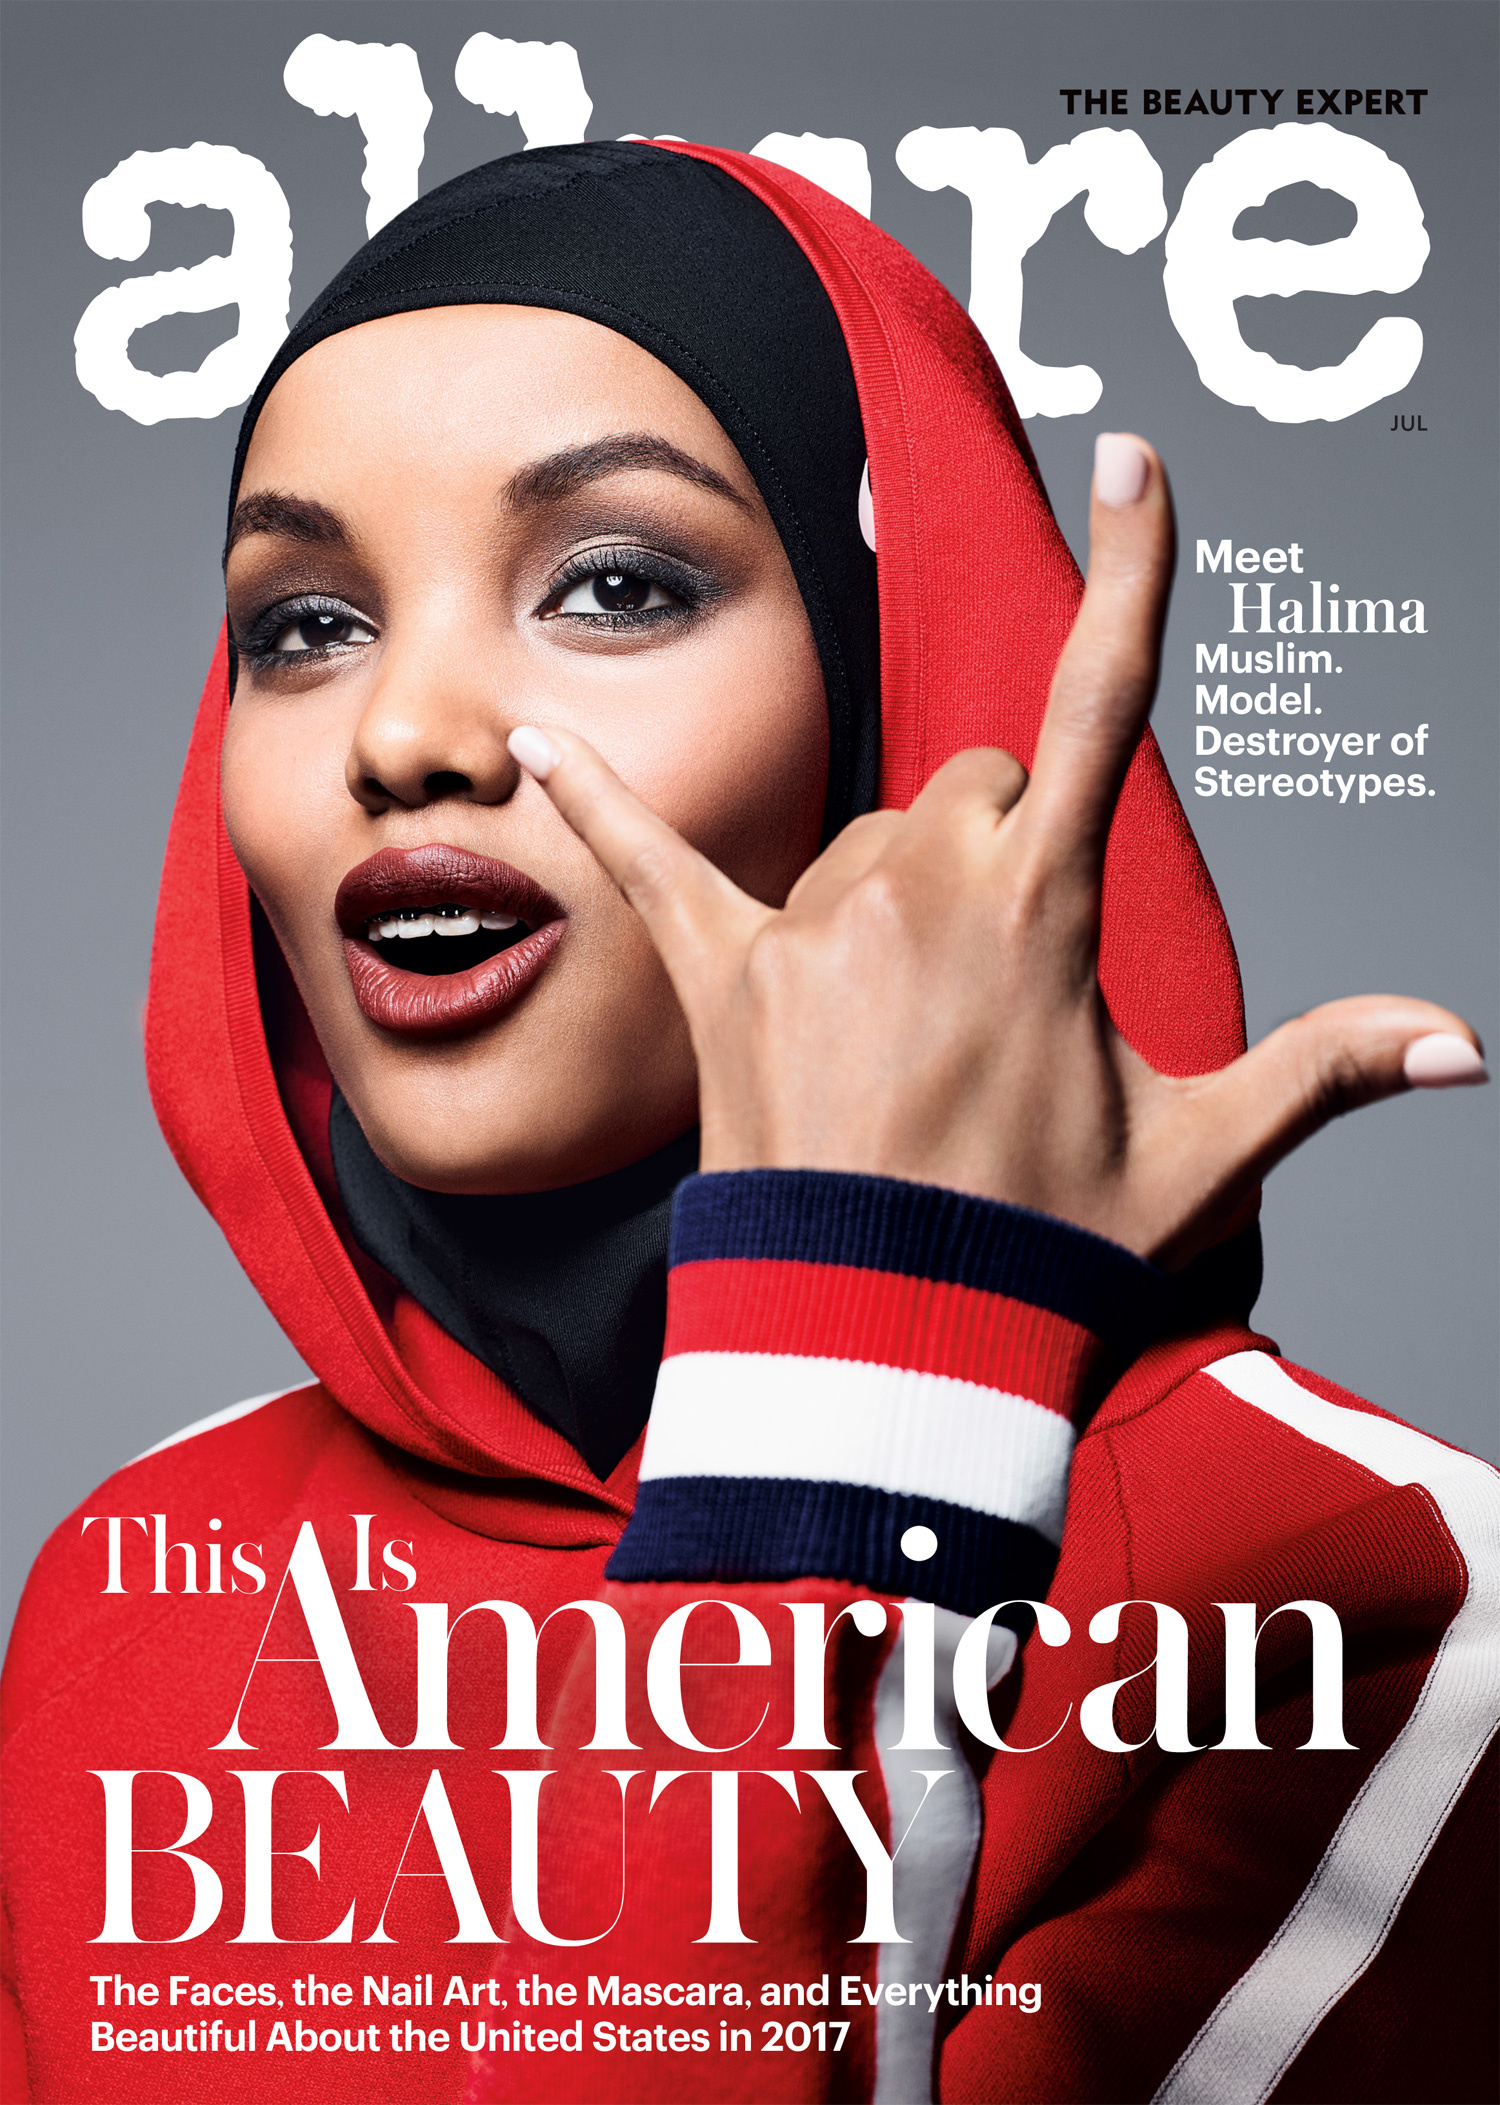 Prima modella hijab copertina Stati Uniti